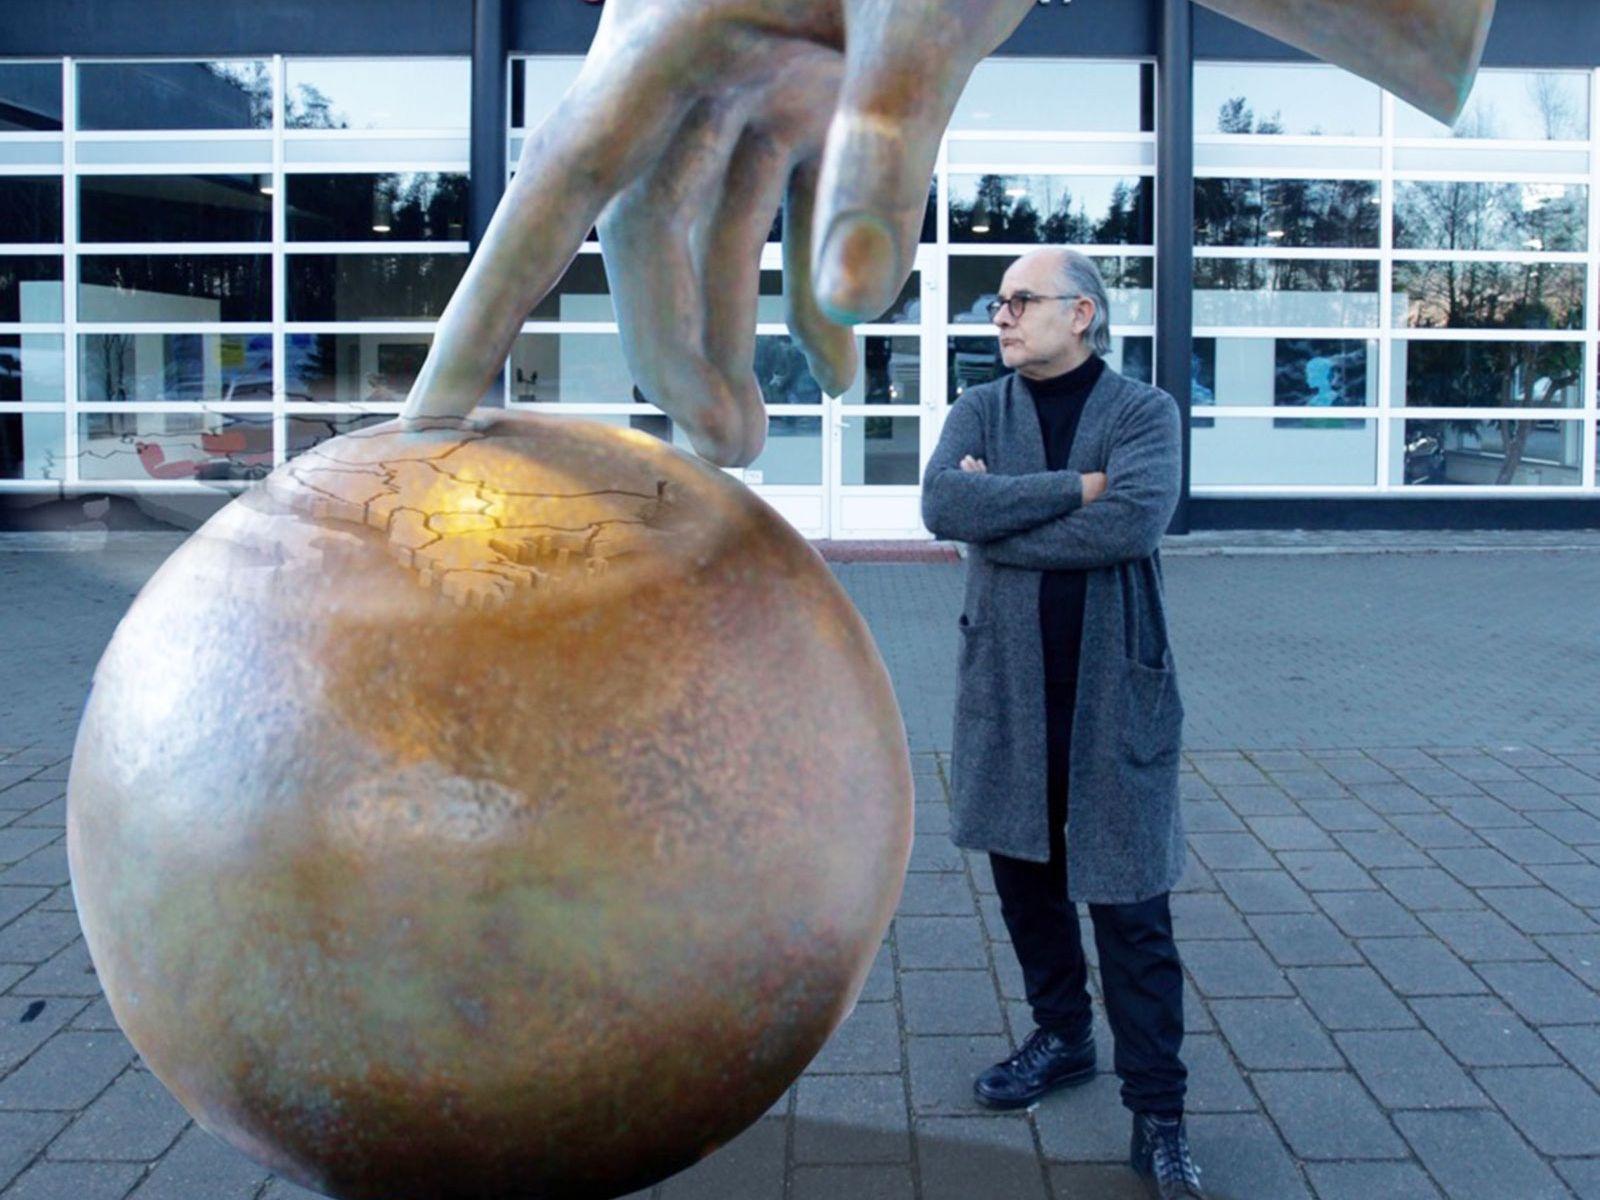 Spanish artist Jull, commissioned to make a sculpture for One Herăstrău Park